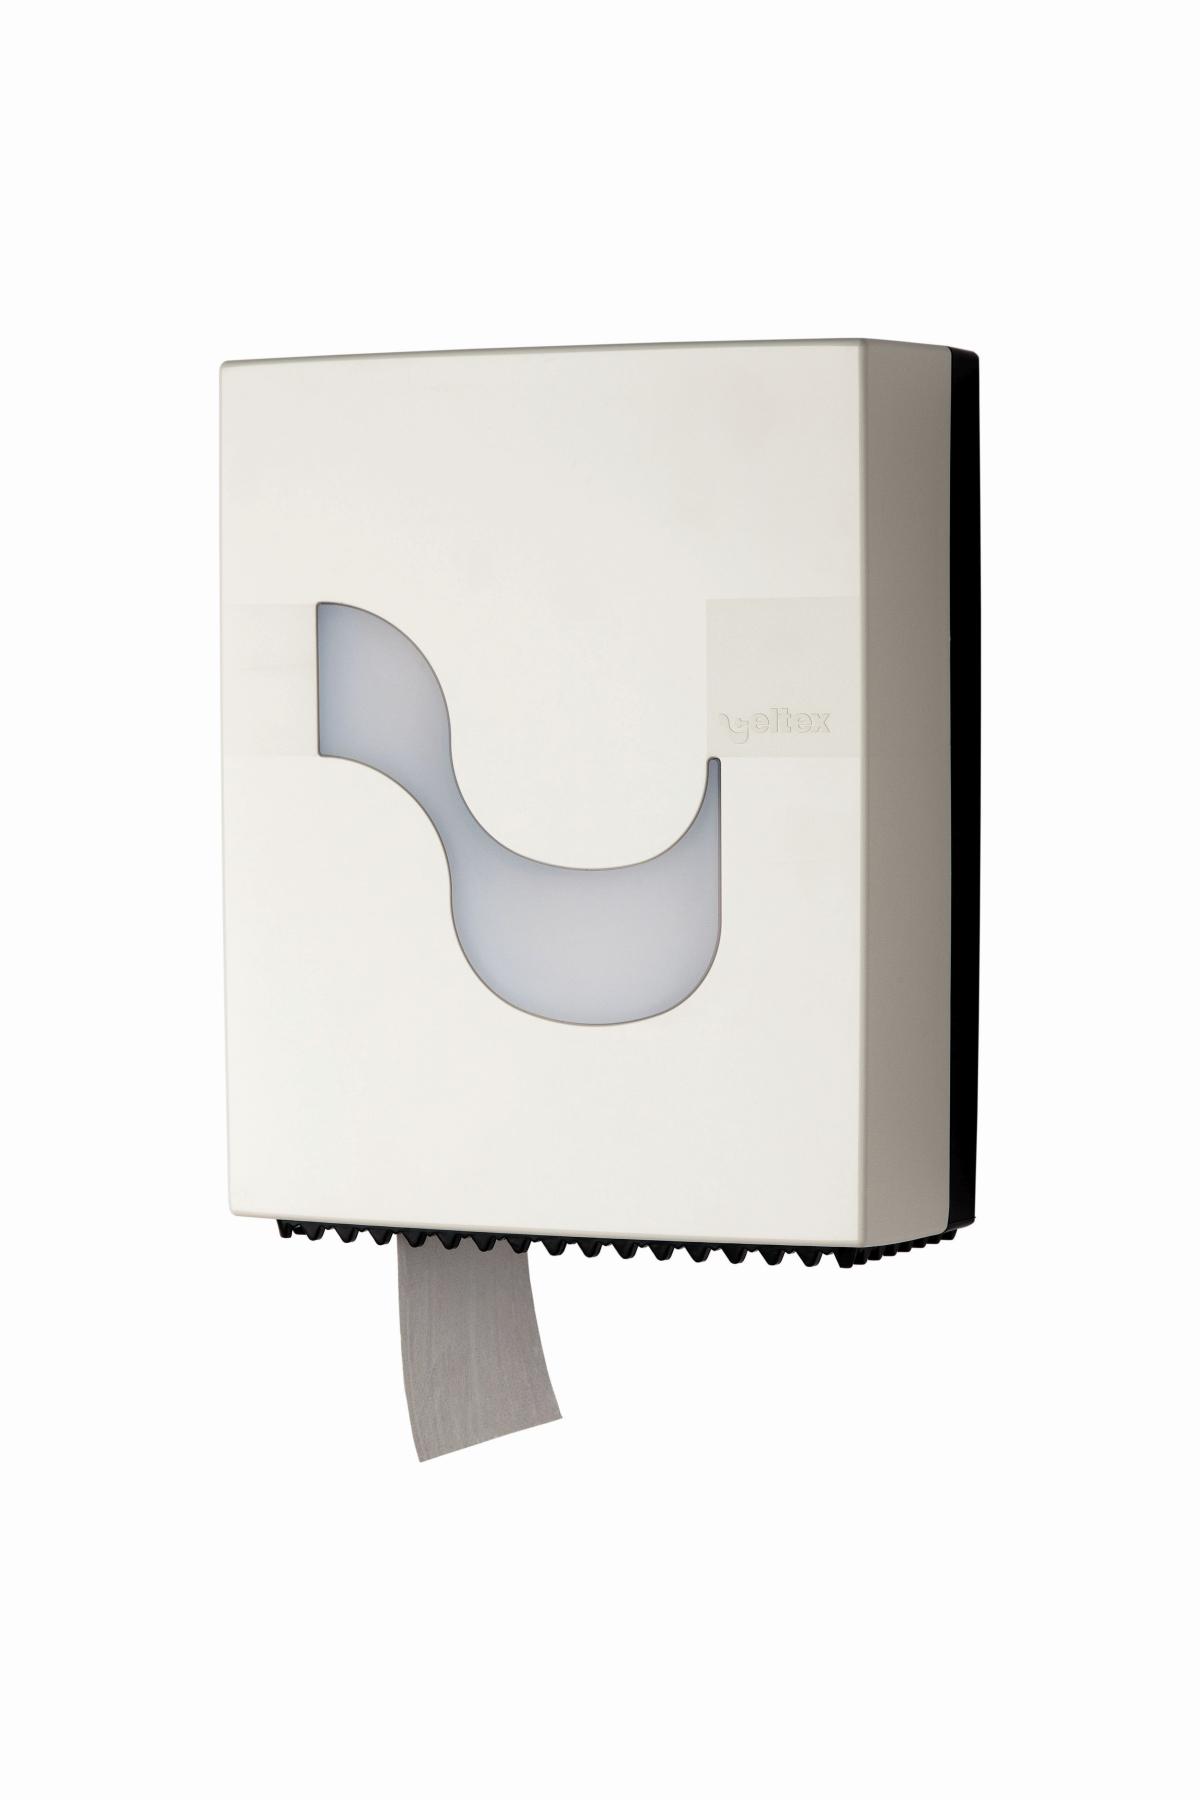 Toilettenpapierspender Mini weiß